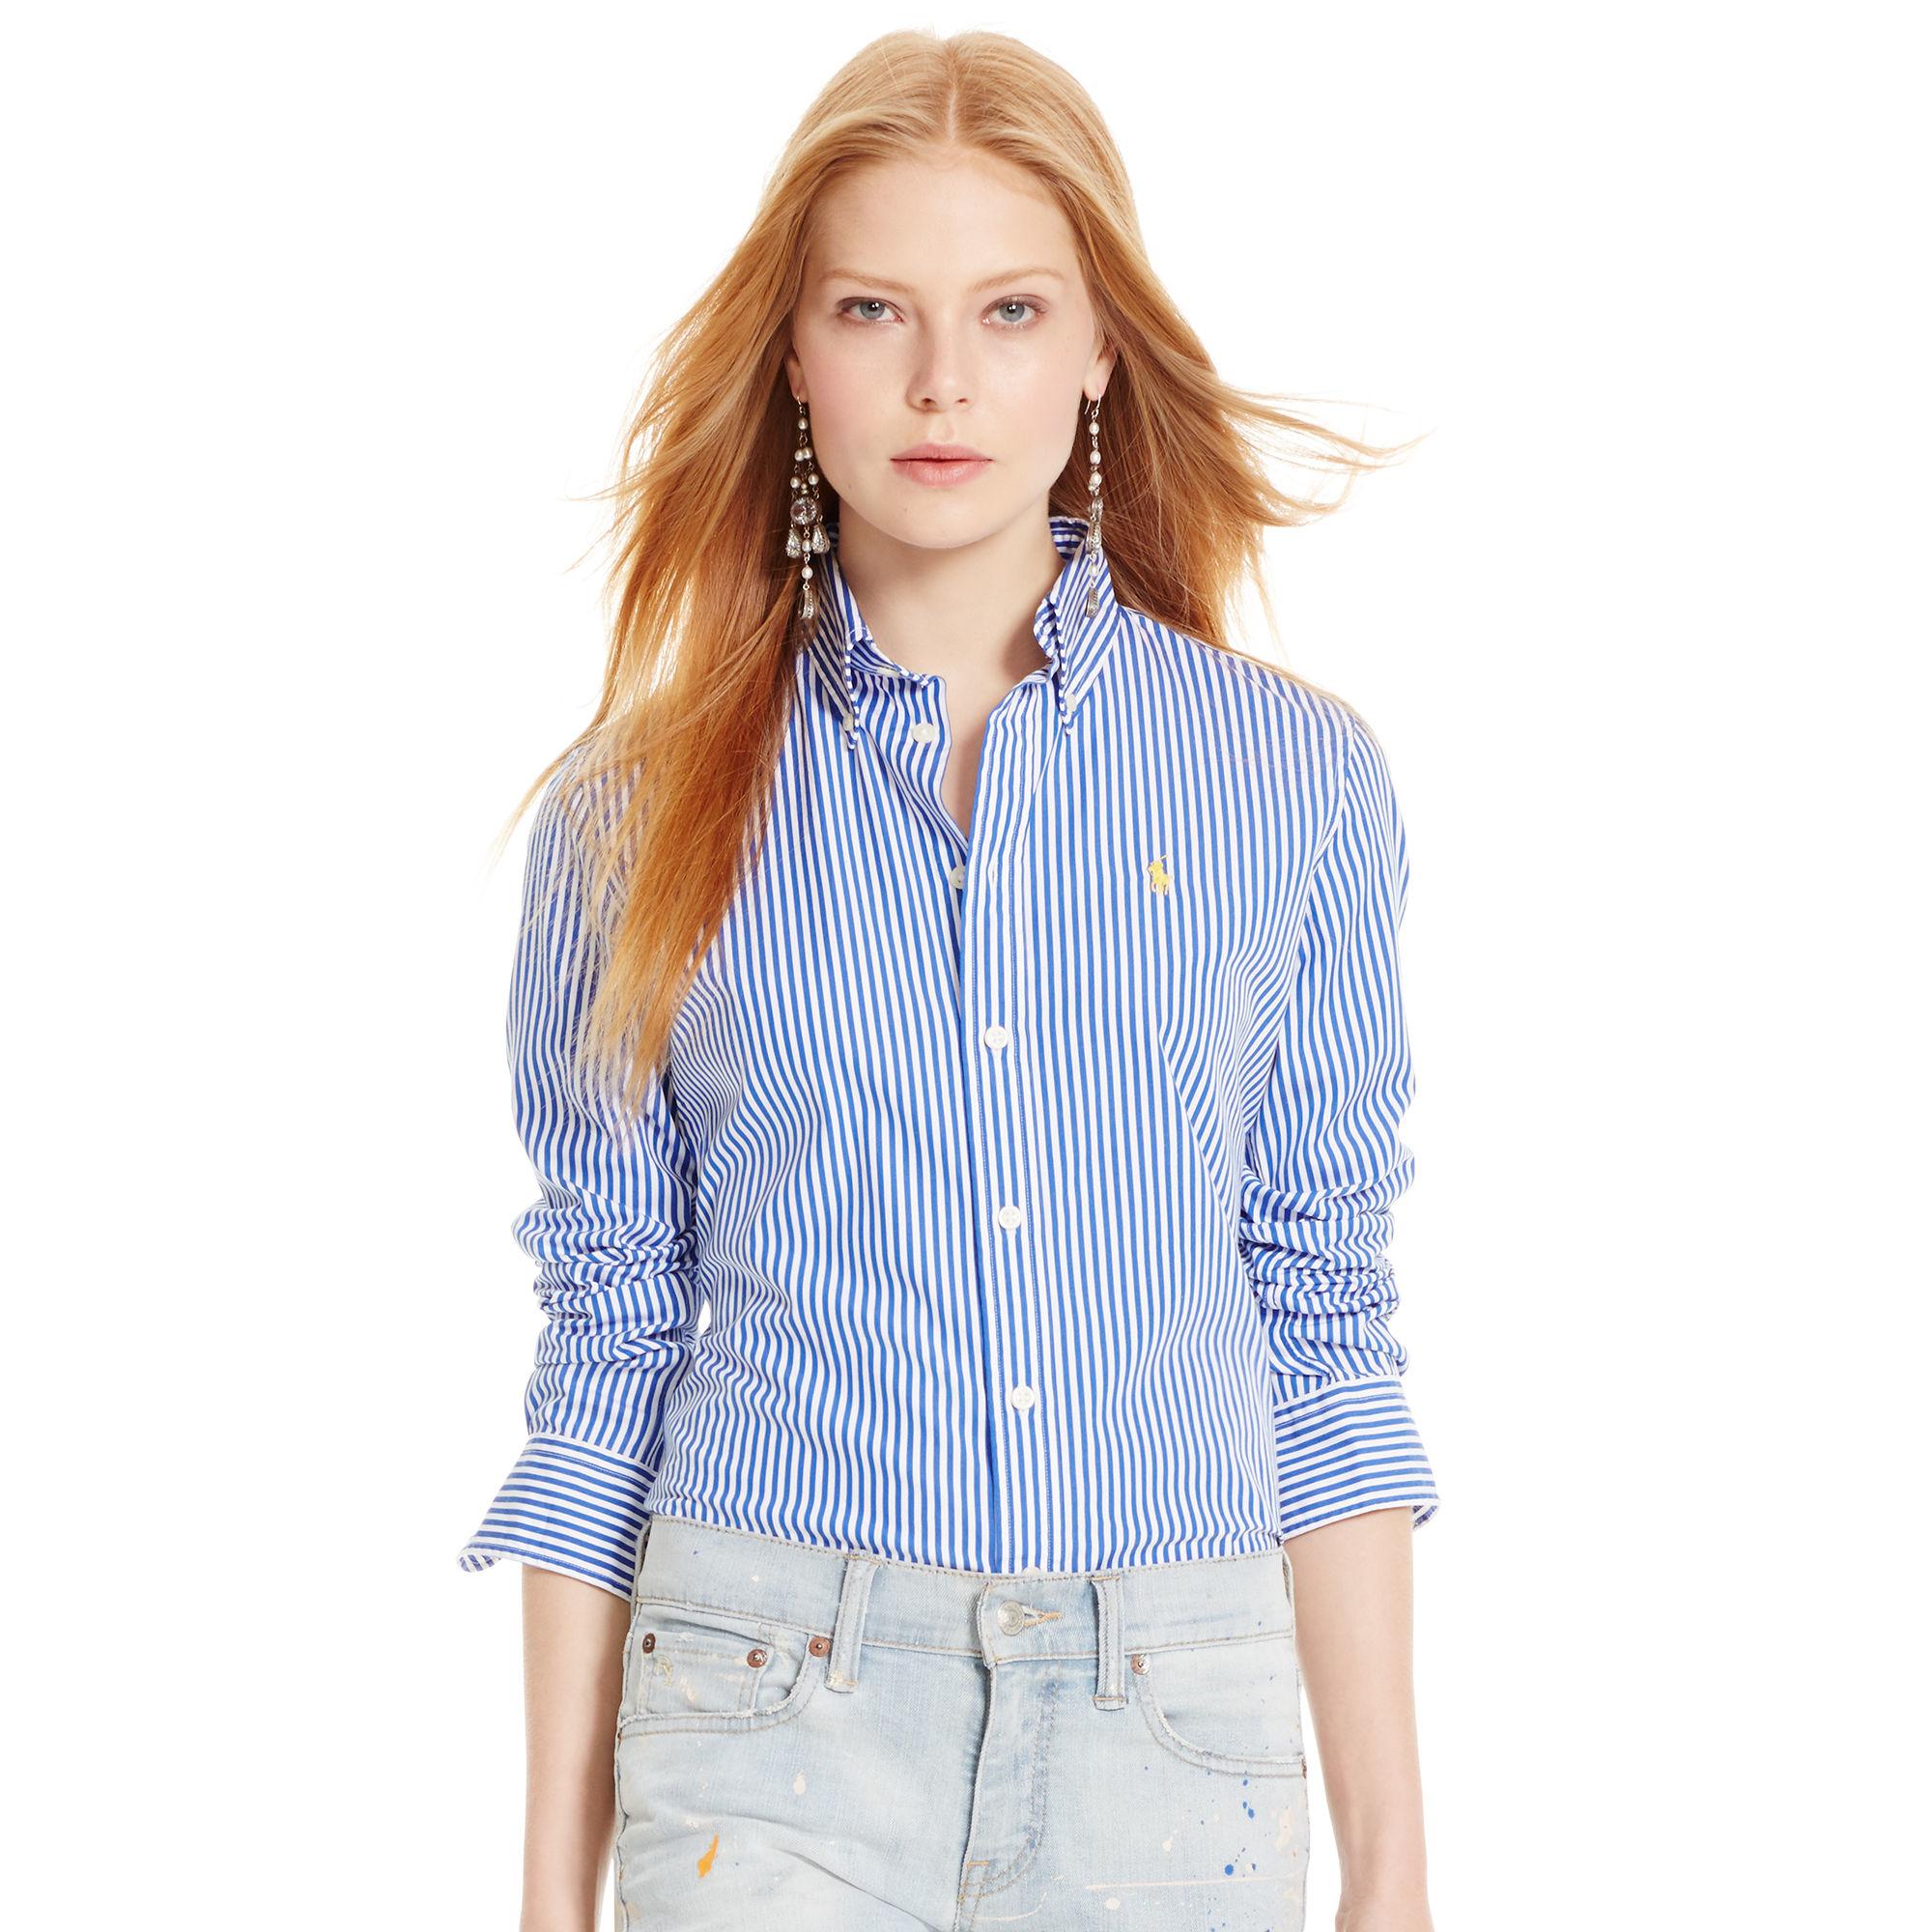 89f1c2bd41 Polo Ralph Lauren Custom-fit Striped Shirt in Blue - Lyst